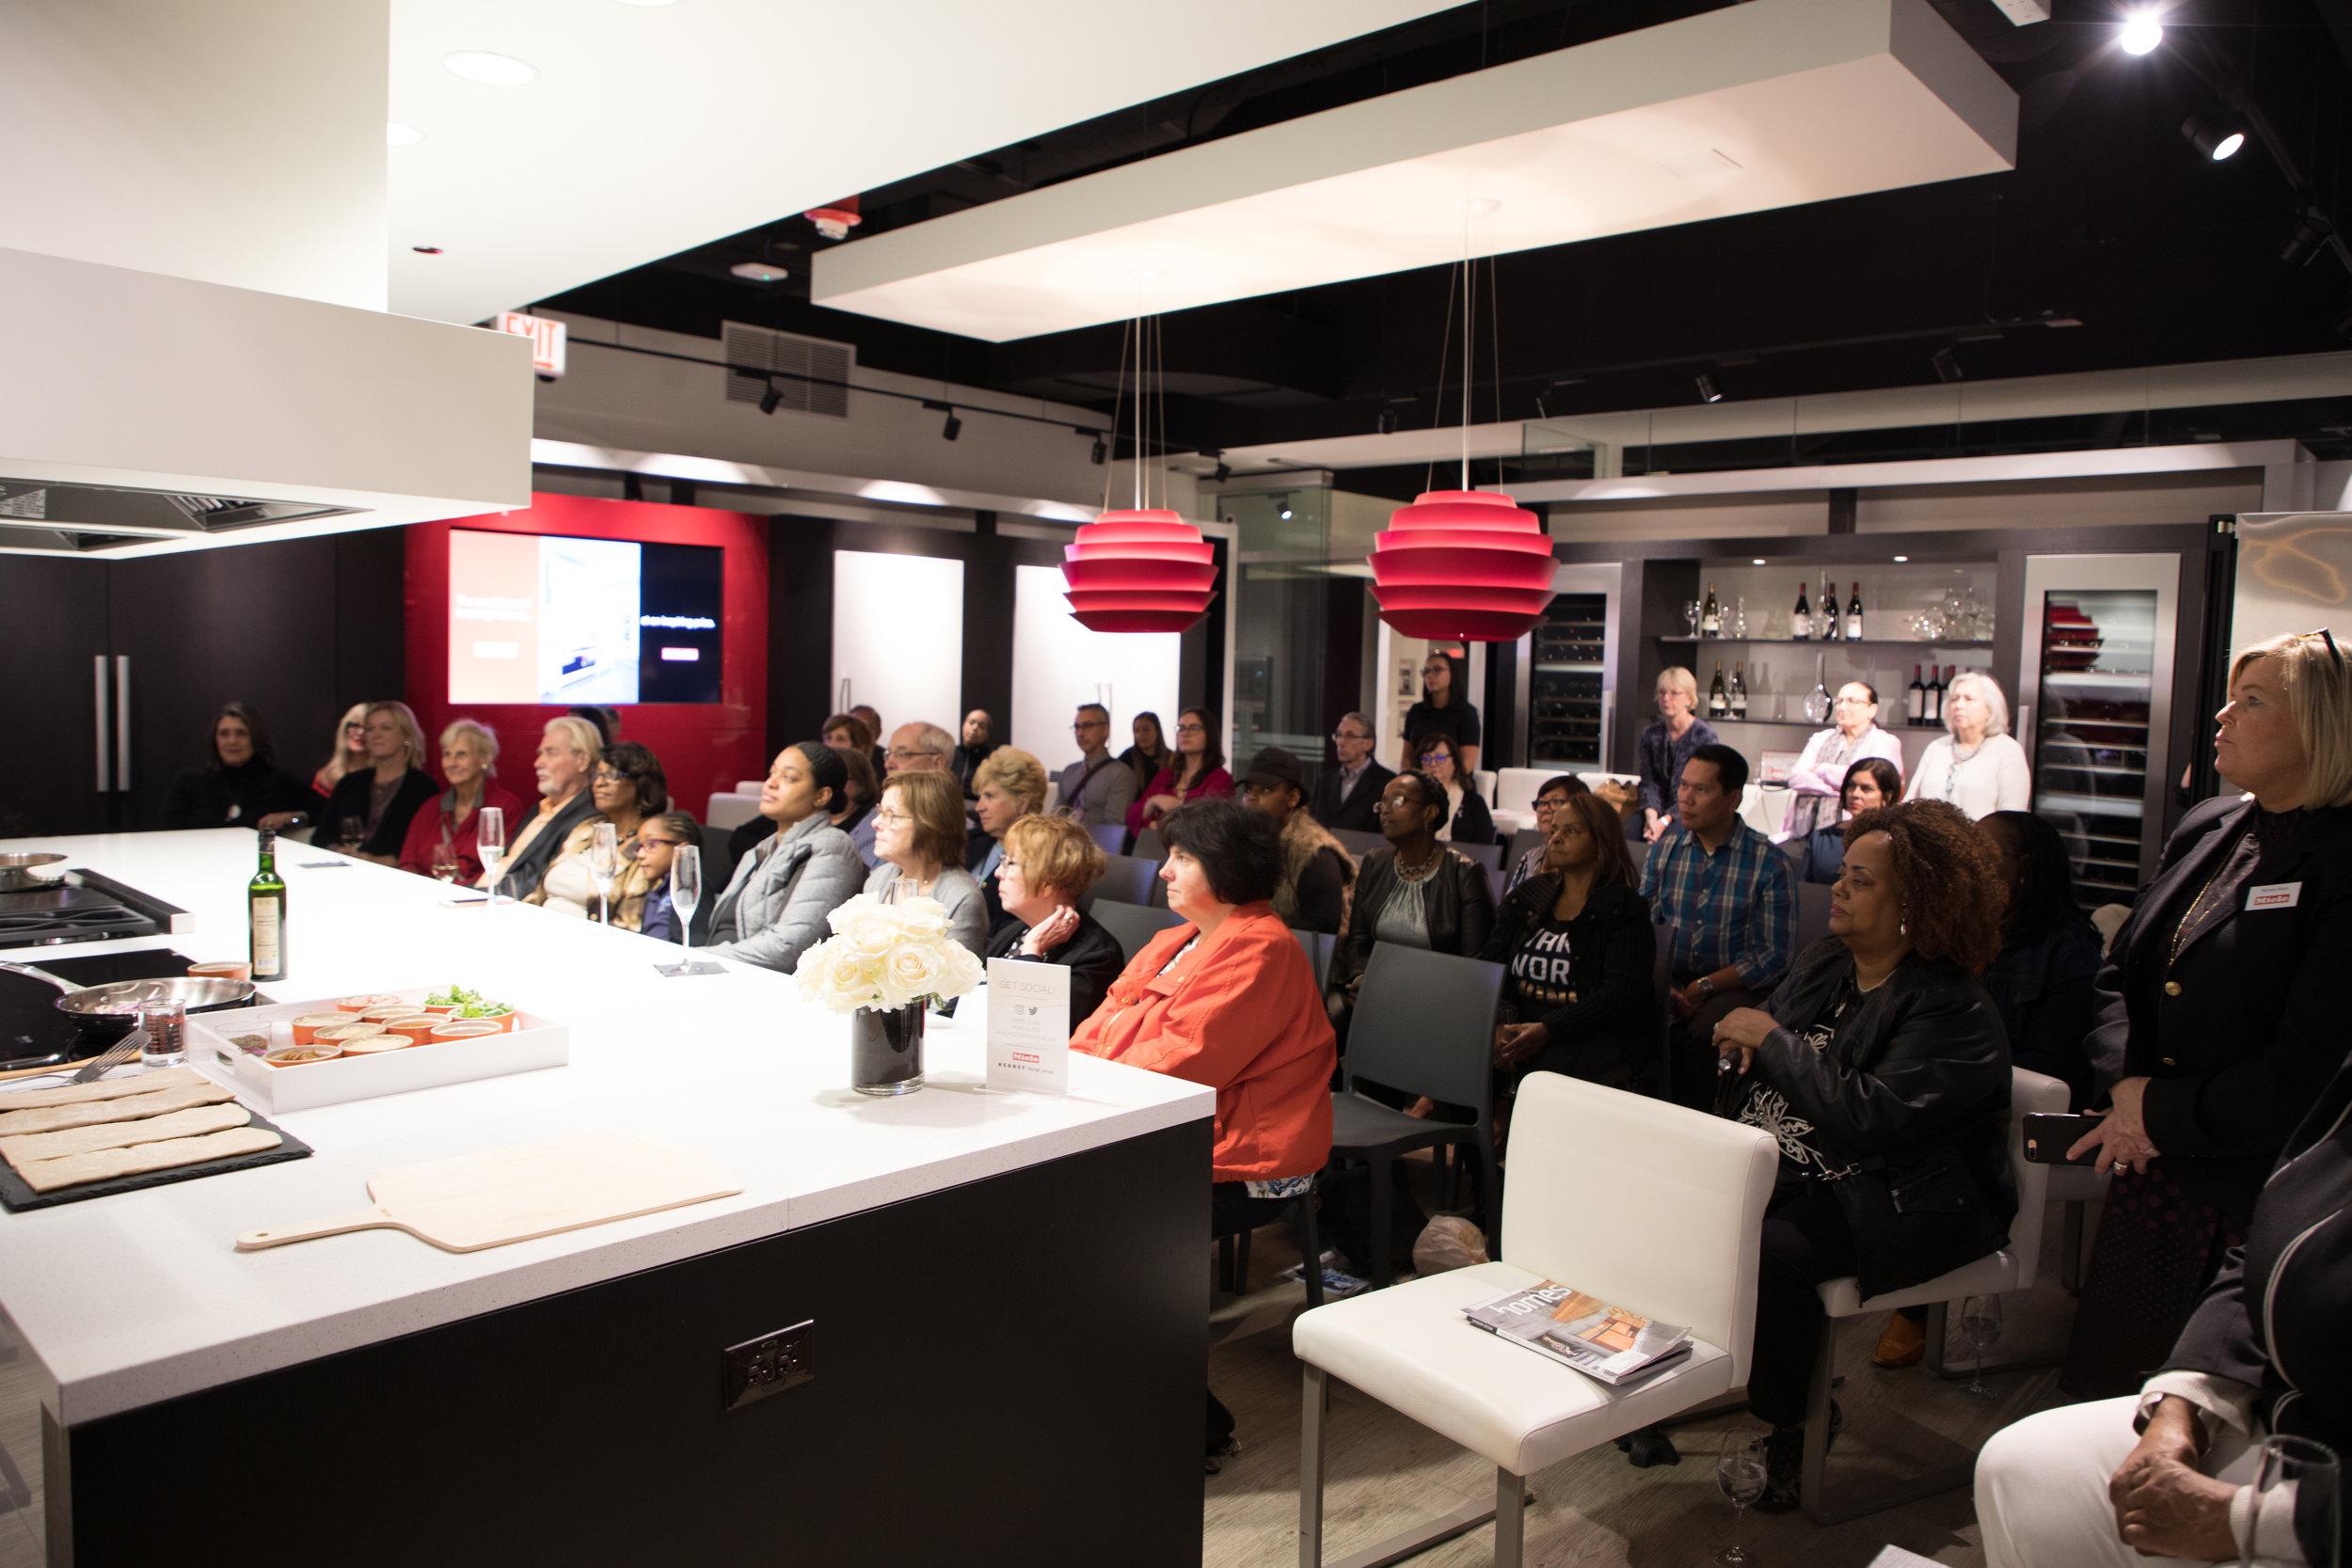 The audience enjoying Ohara Davies-Gaetano's cooking demonstration